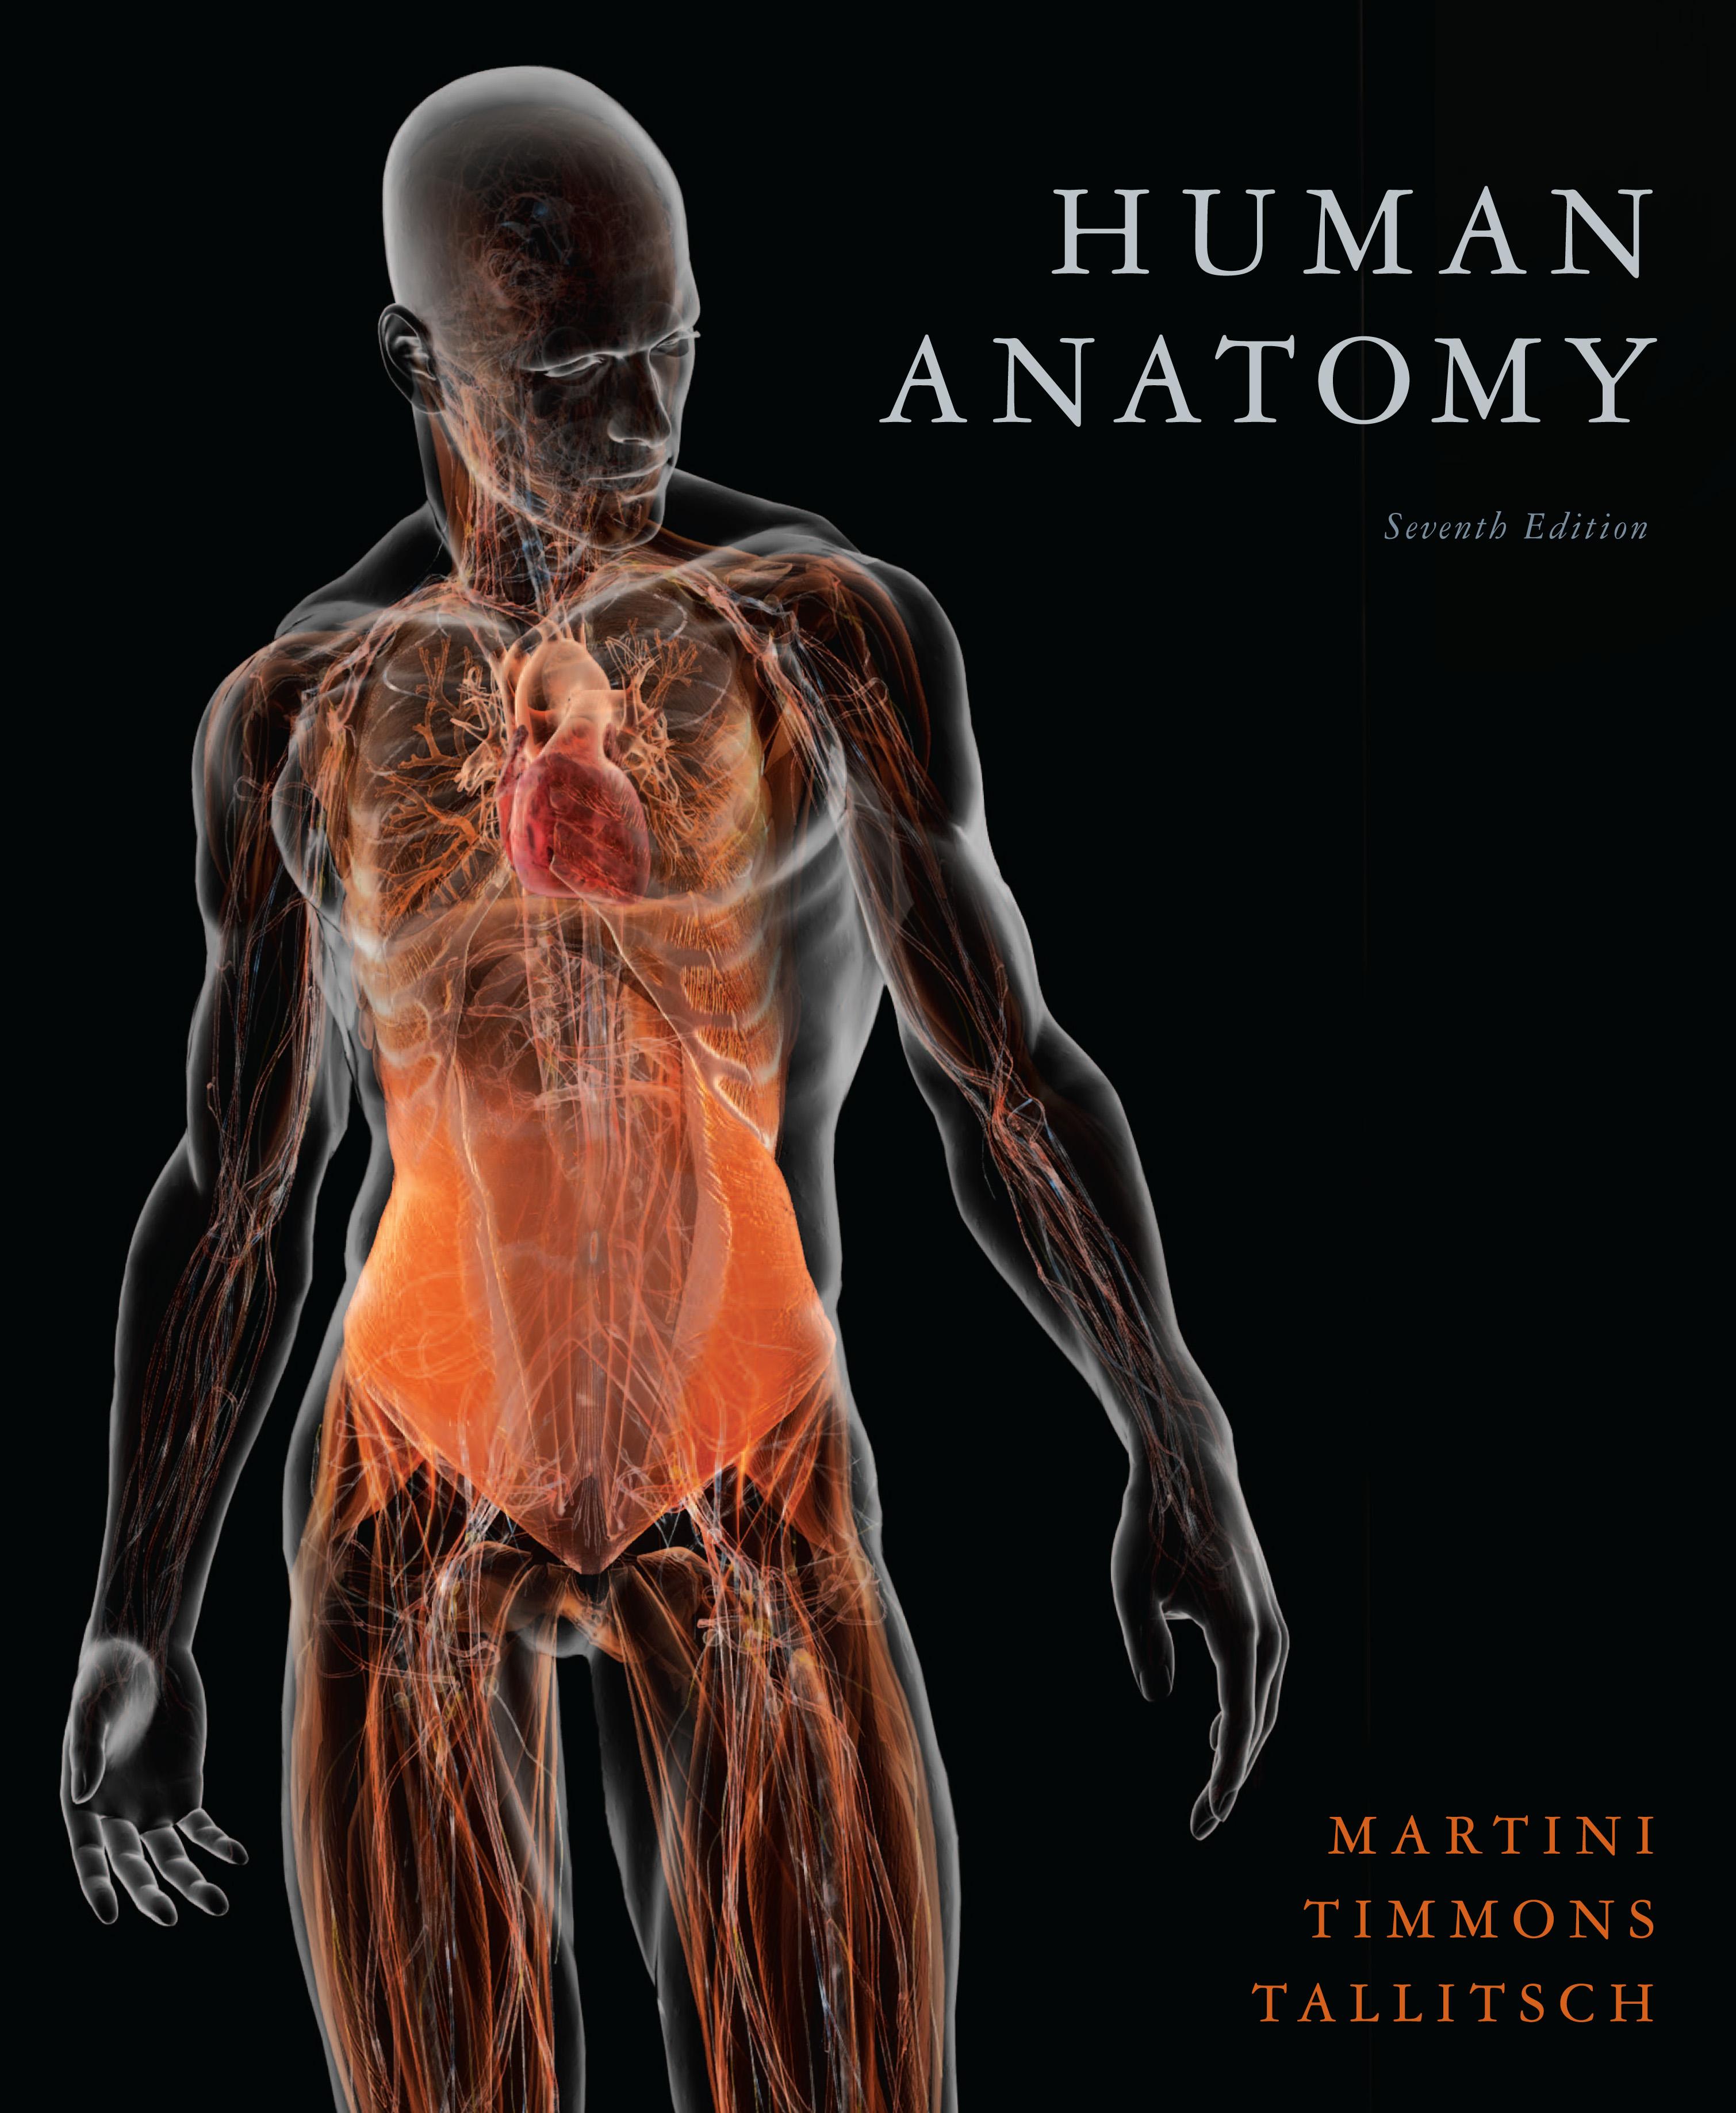 Images Of Human Anatomy Wallpaper Spacehero